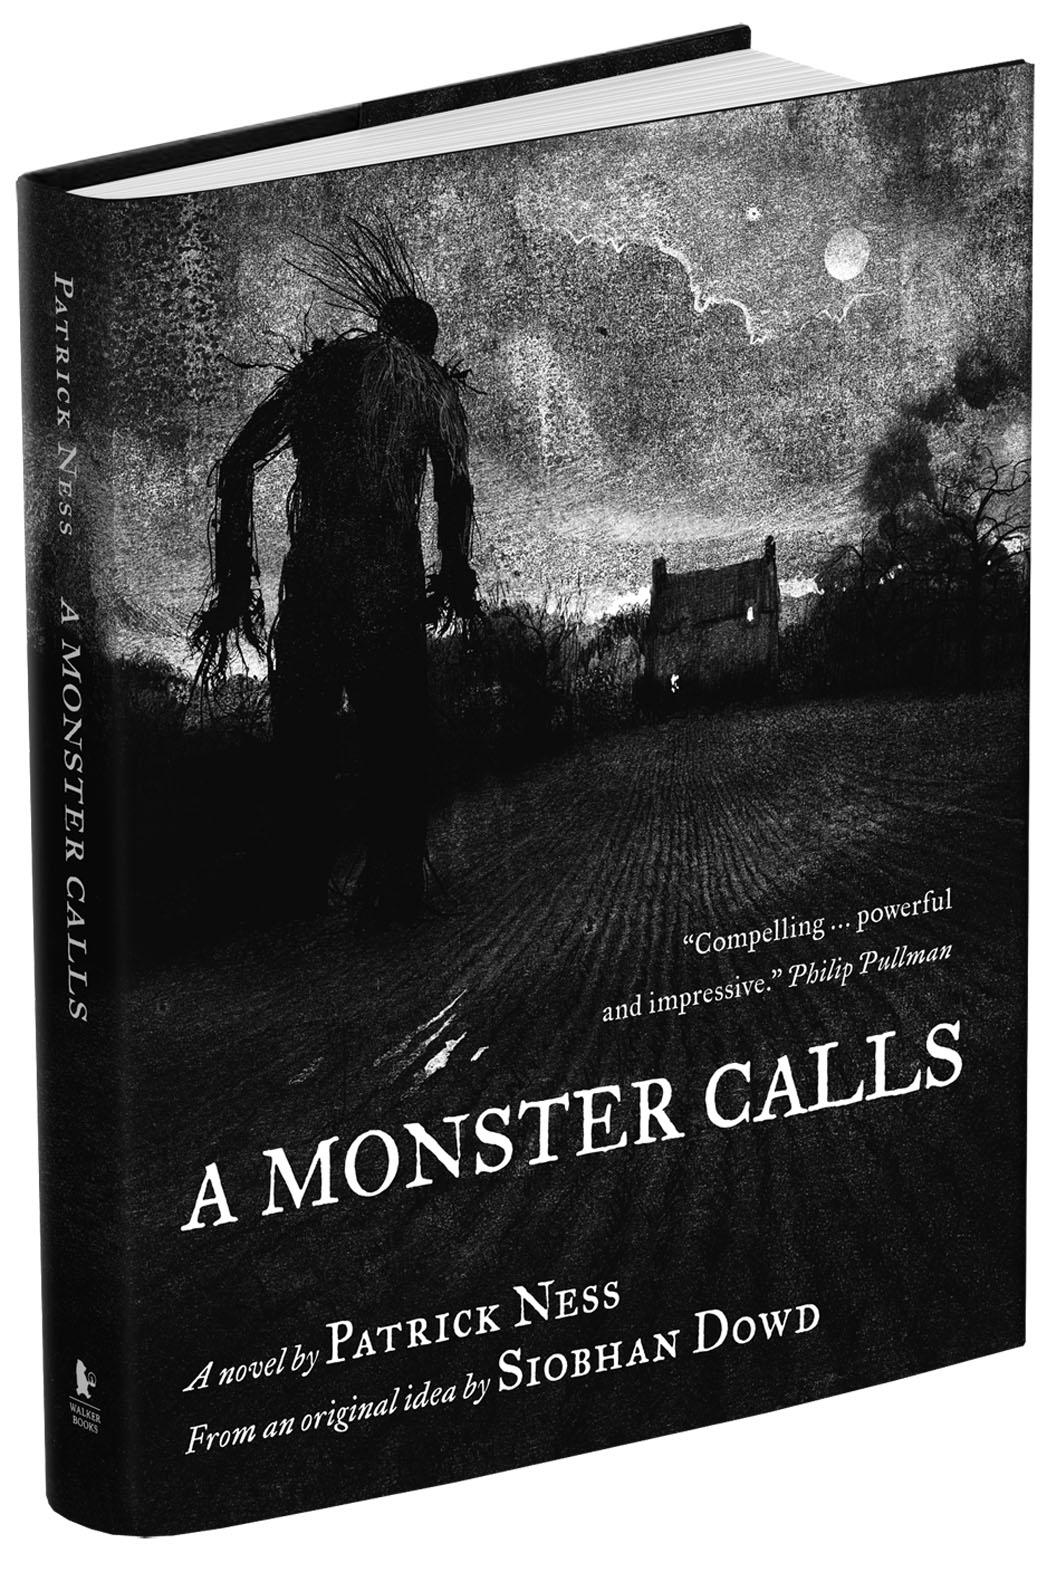 A Monster Calls Book Cover Patrick Ness - P 2014